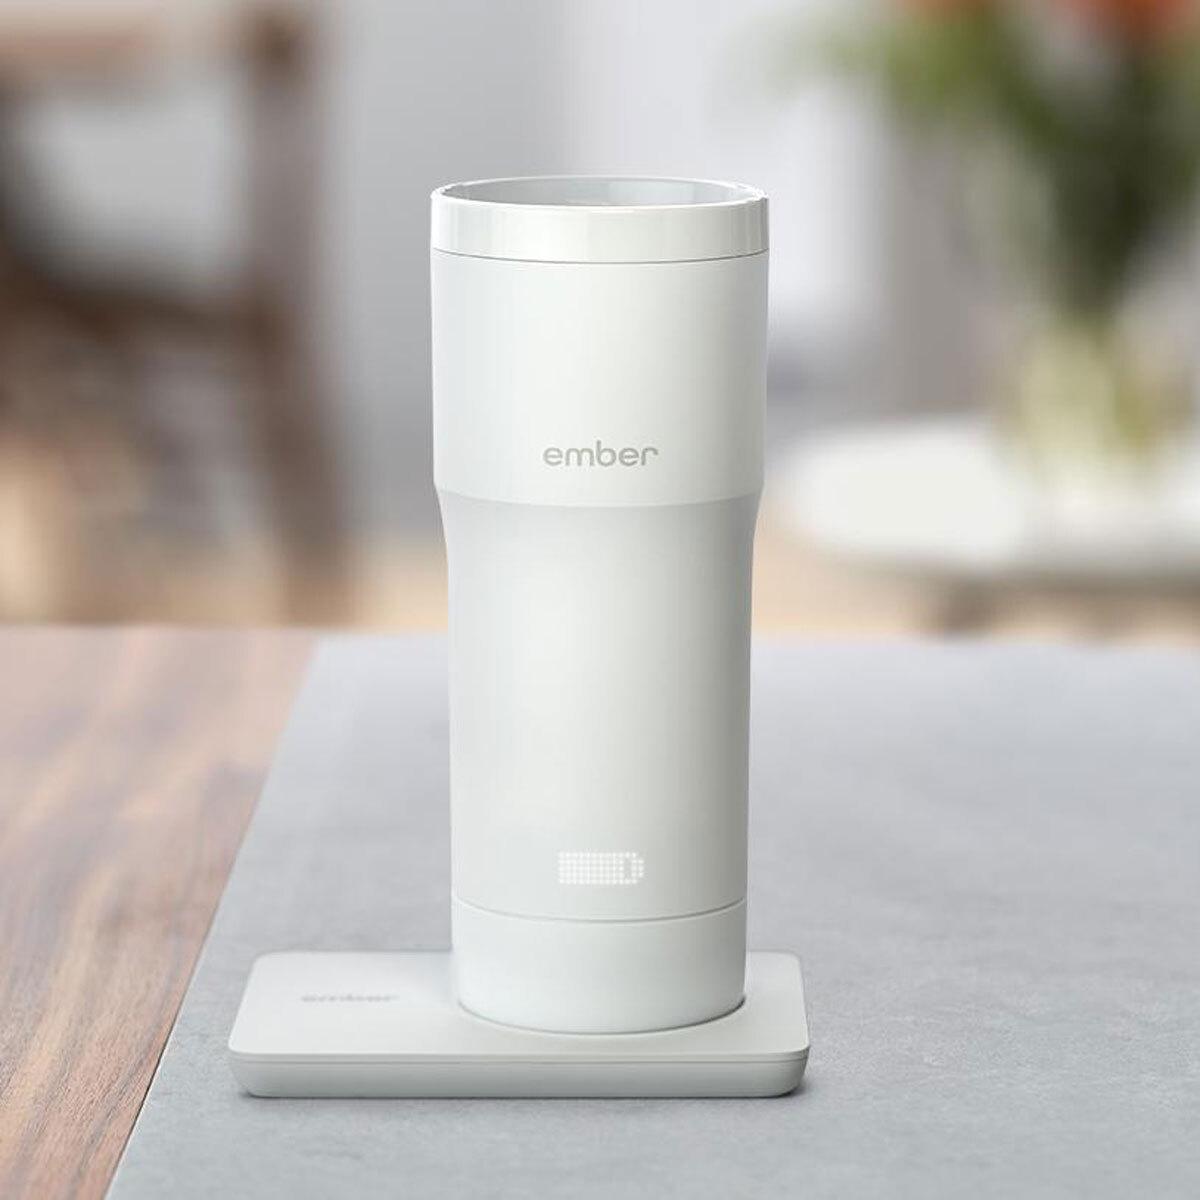 Ember Temperature Control Travel Mug White Costco Uk